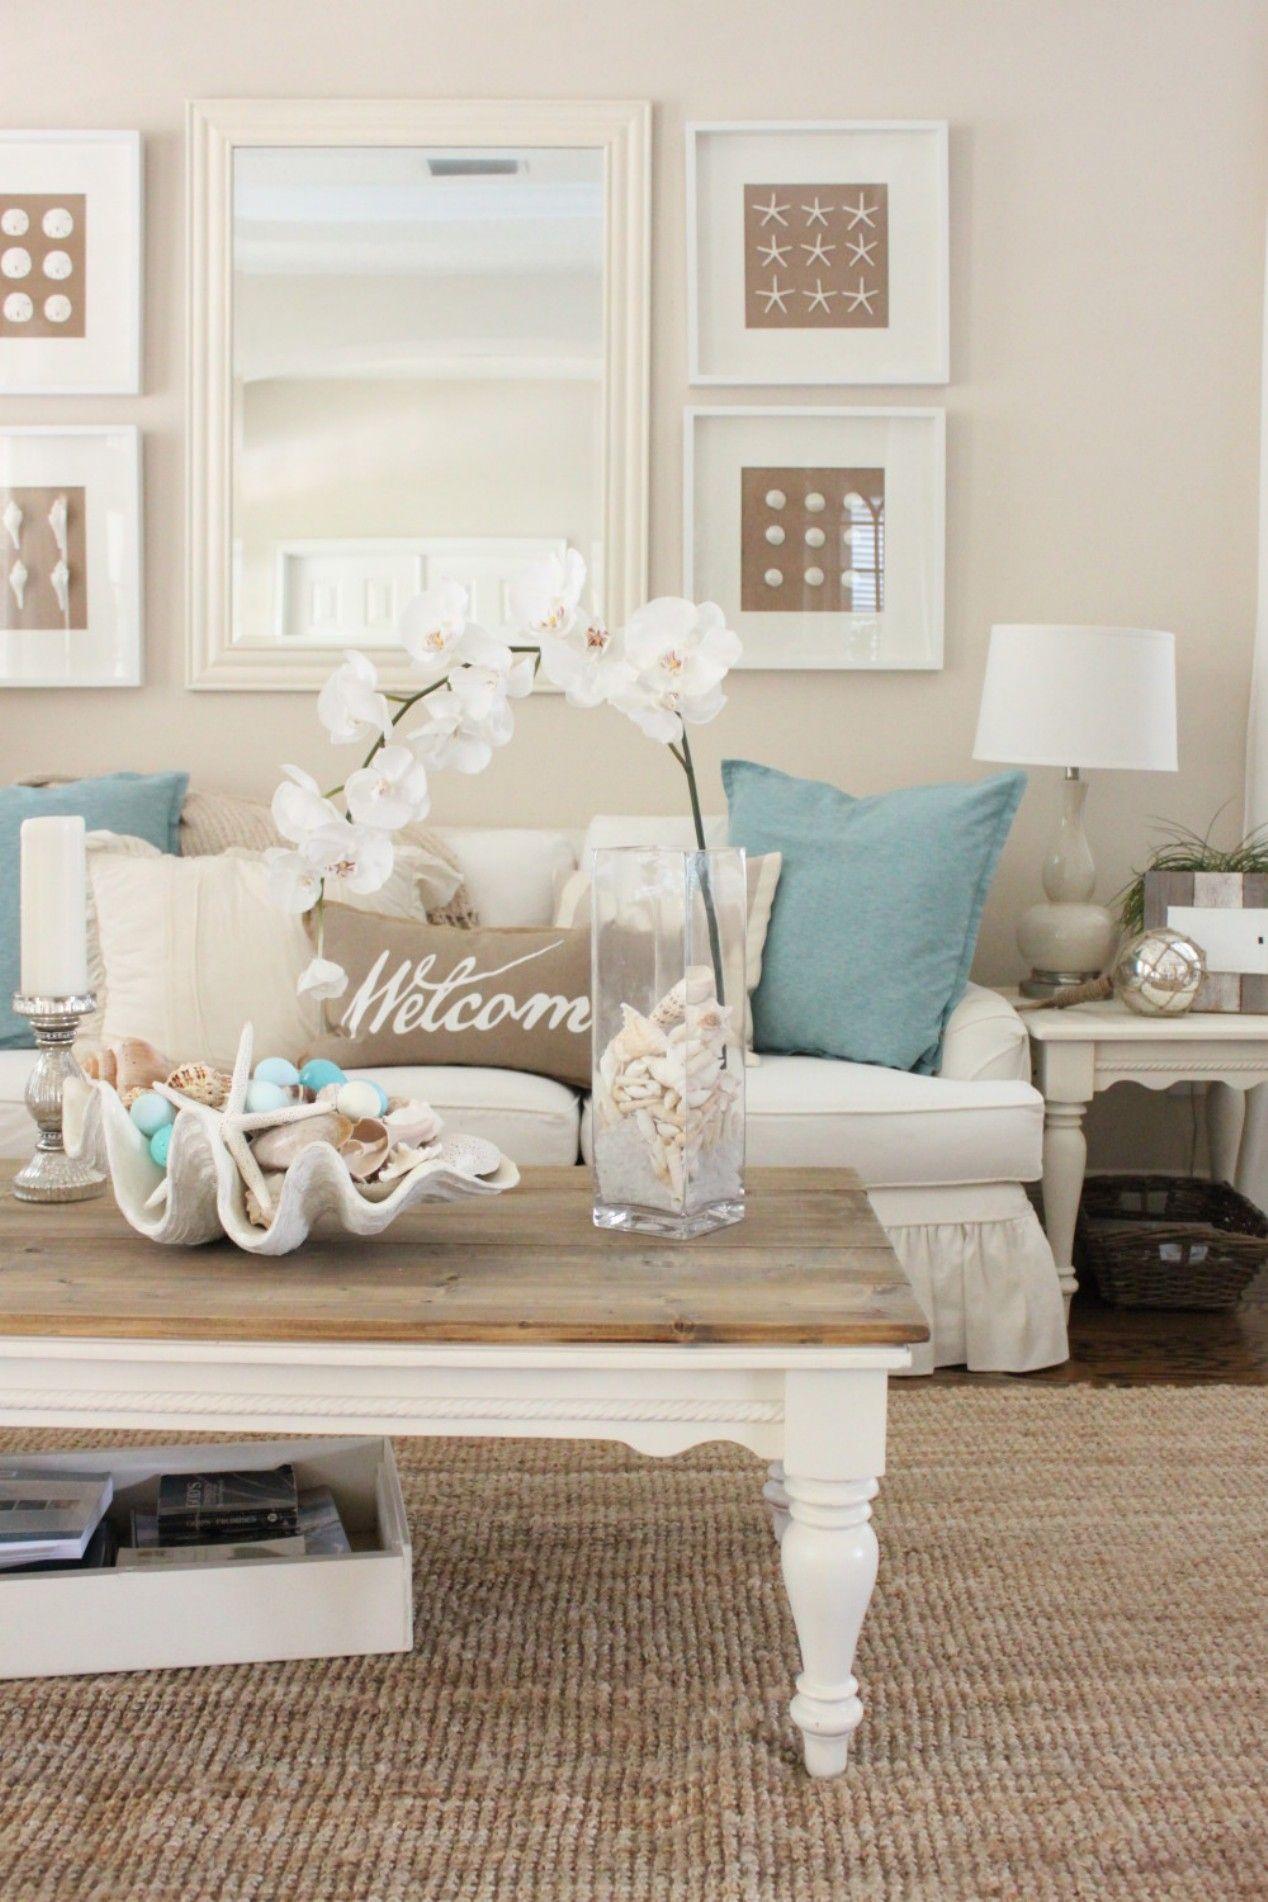 Nice 99 gorgeous coastal living room decorating ideas beach themed living room coastal decor living